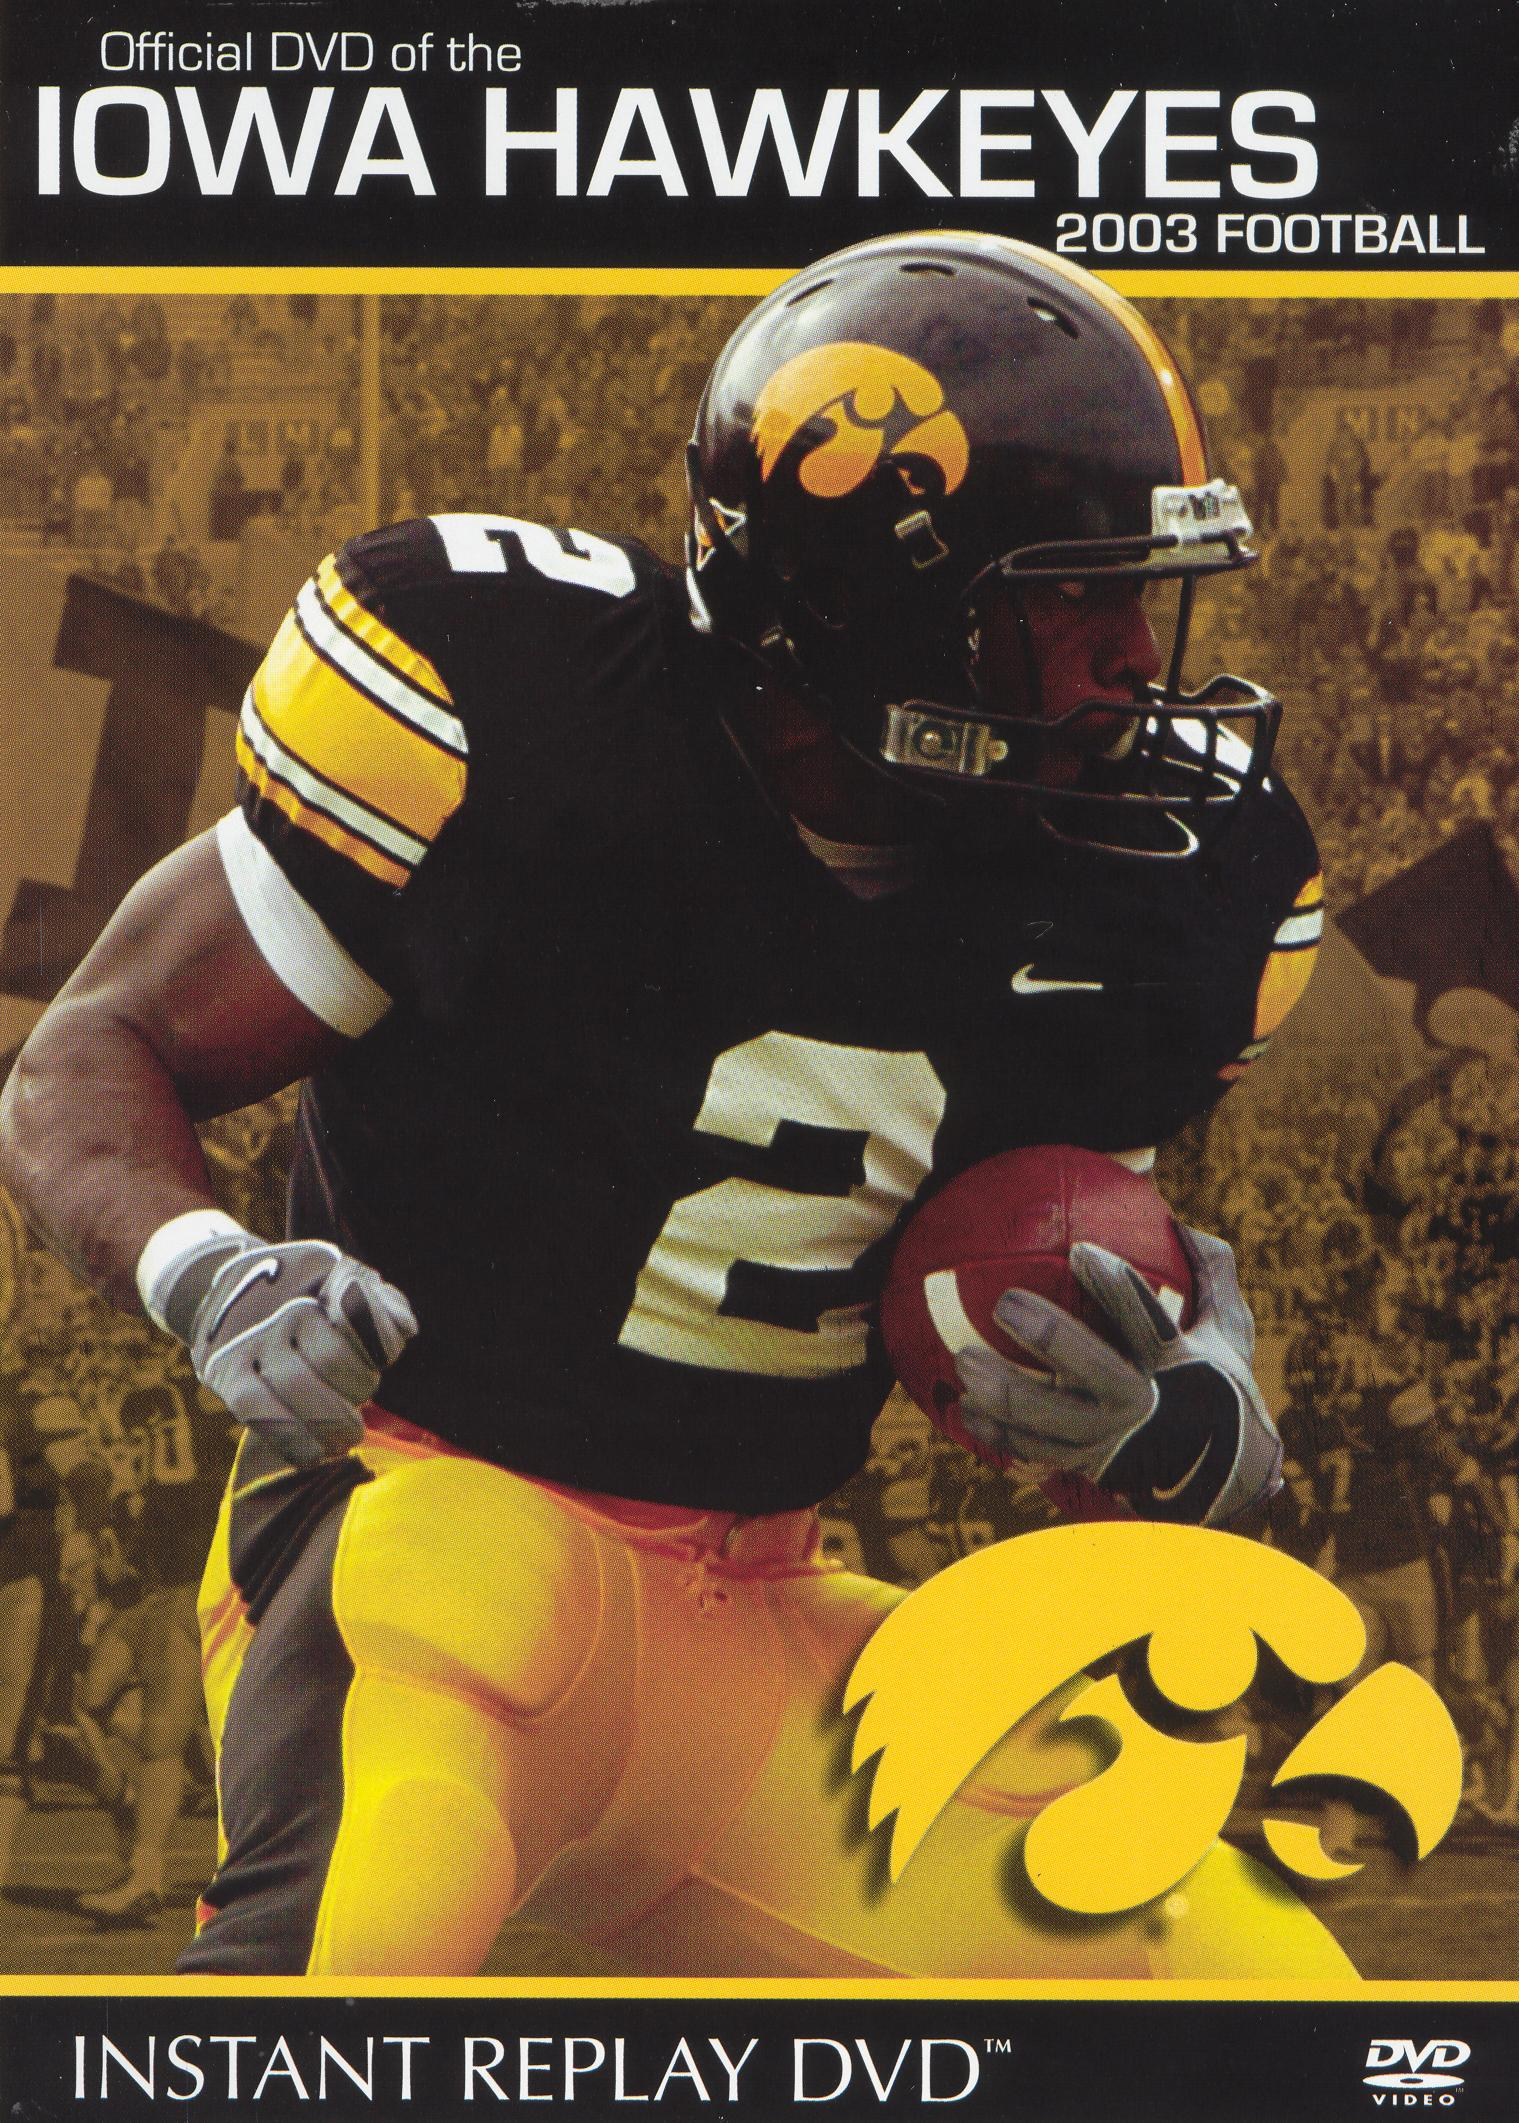 2003 Football Instant Replay: Iowa Hawkeyes